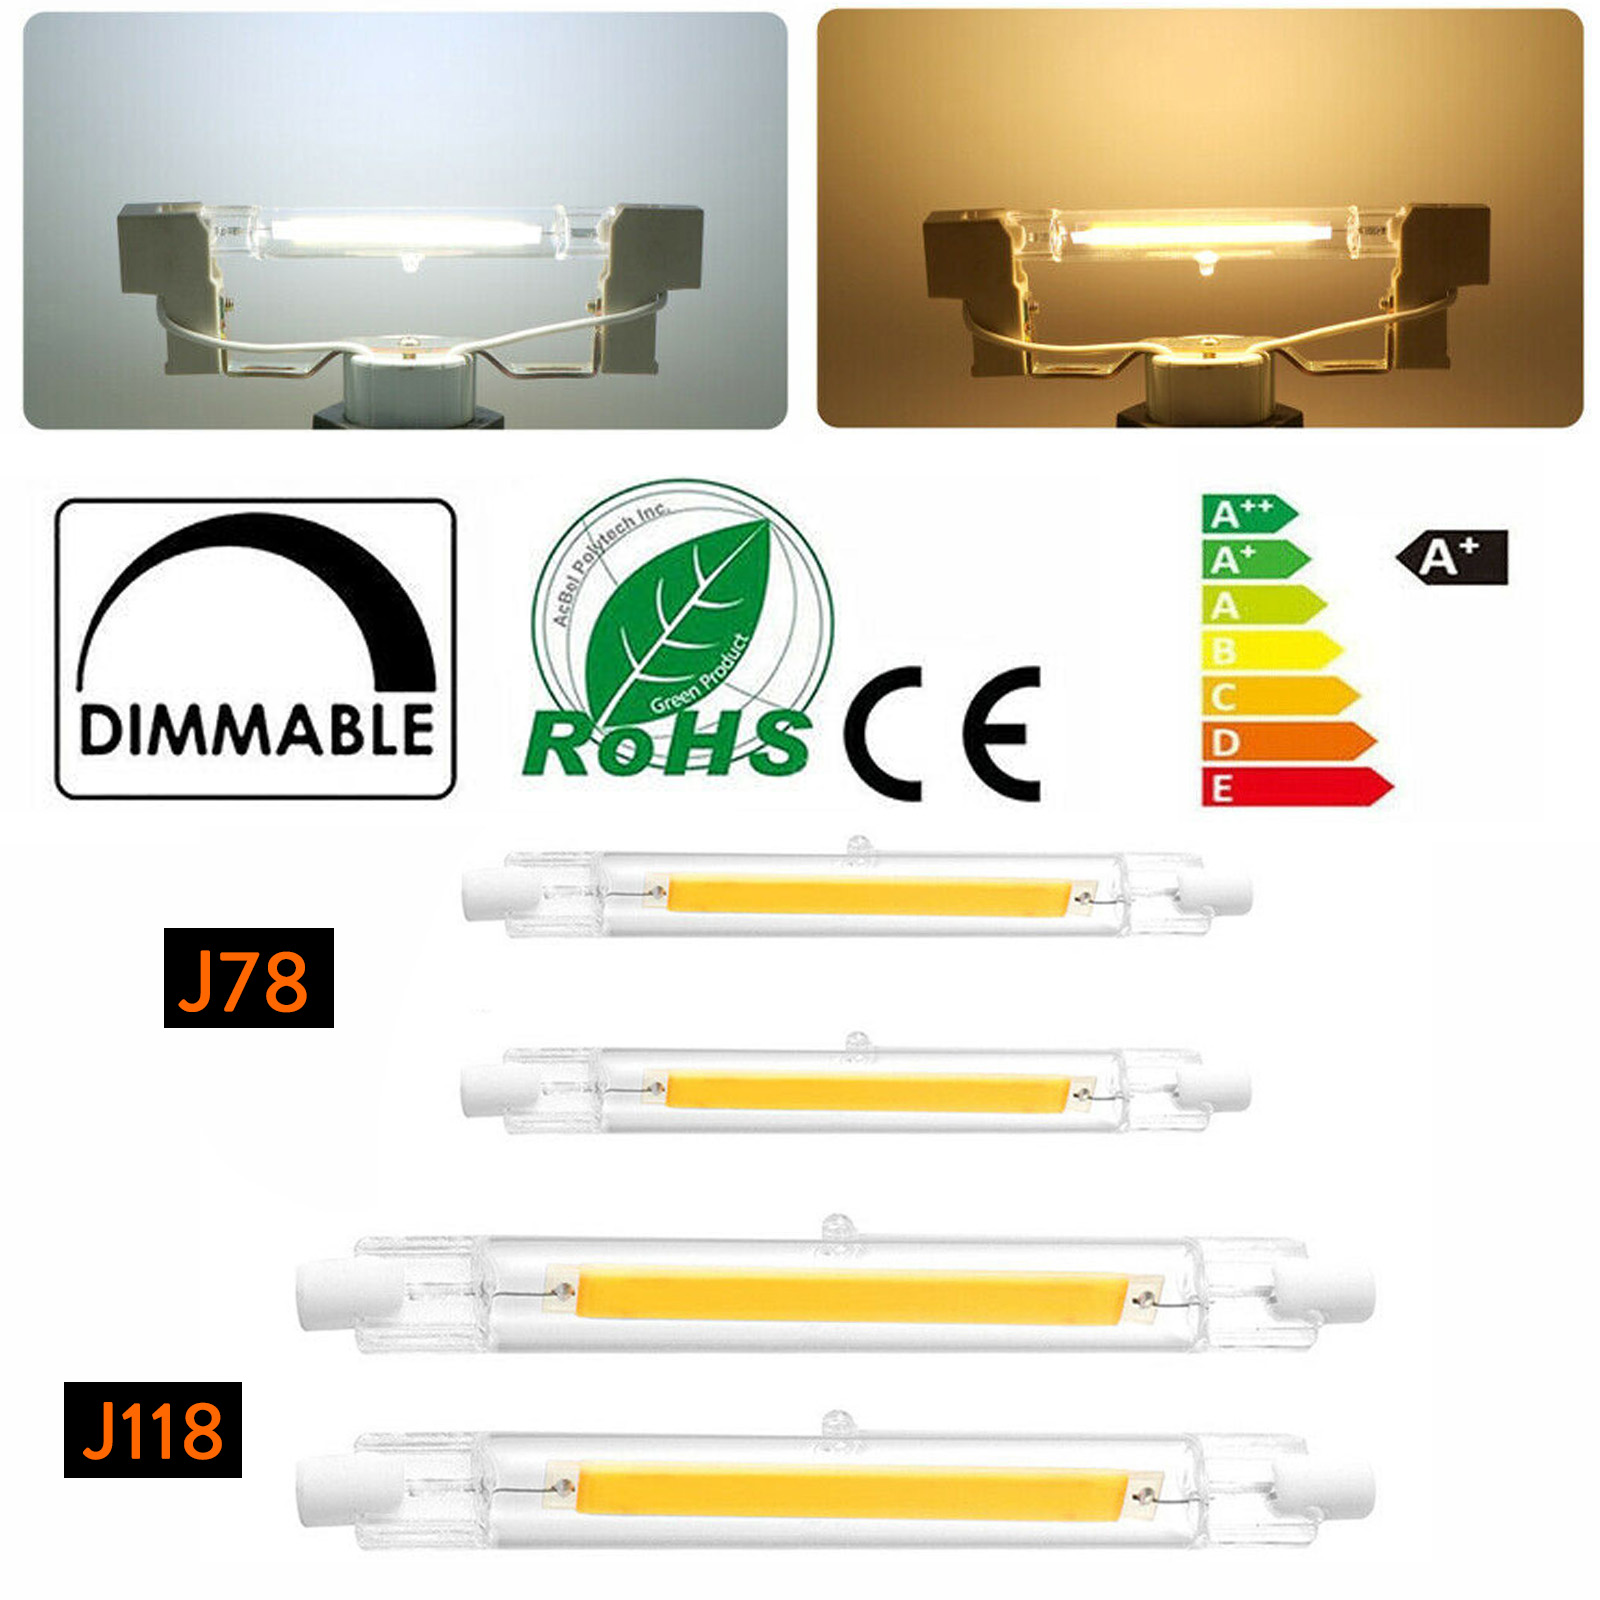 118mm J118 78mm J78 6W 12W 20W 110V 220V R7s R7S LED Glass Ceramic Tube Light Bulbs Dimmable COB Lamp  For Foodlight Lighting